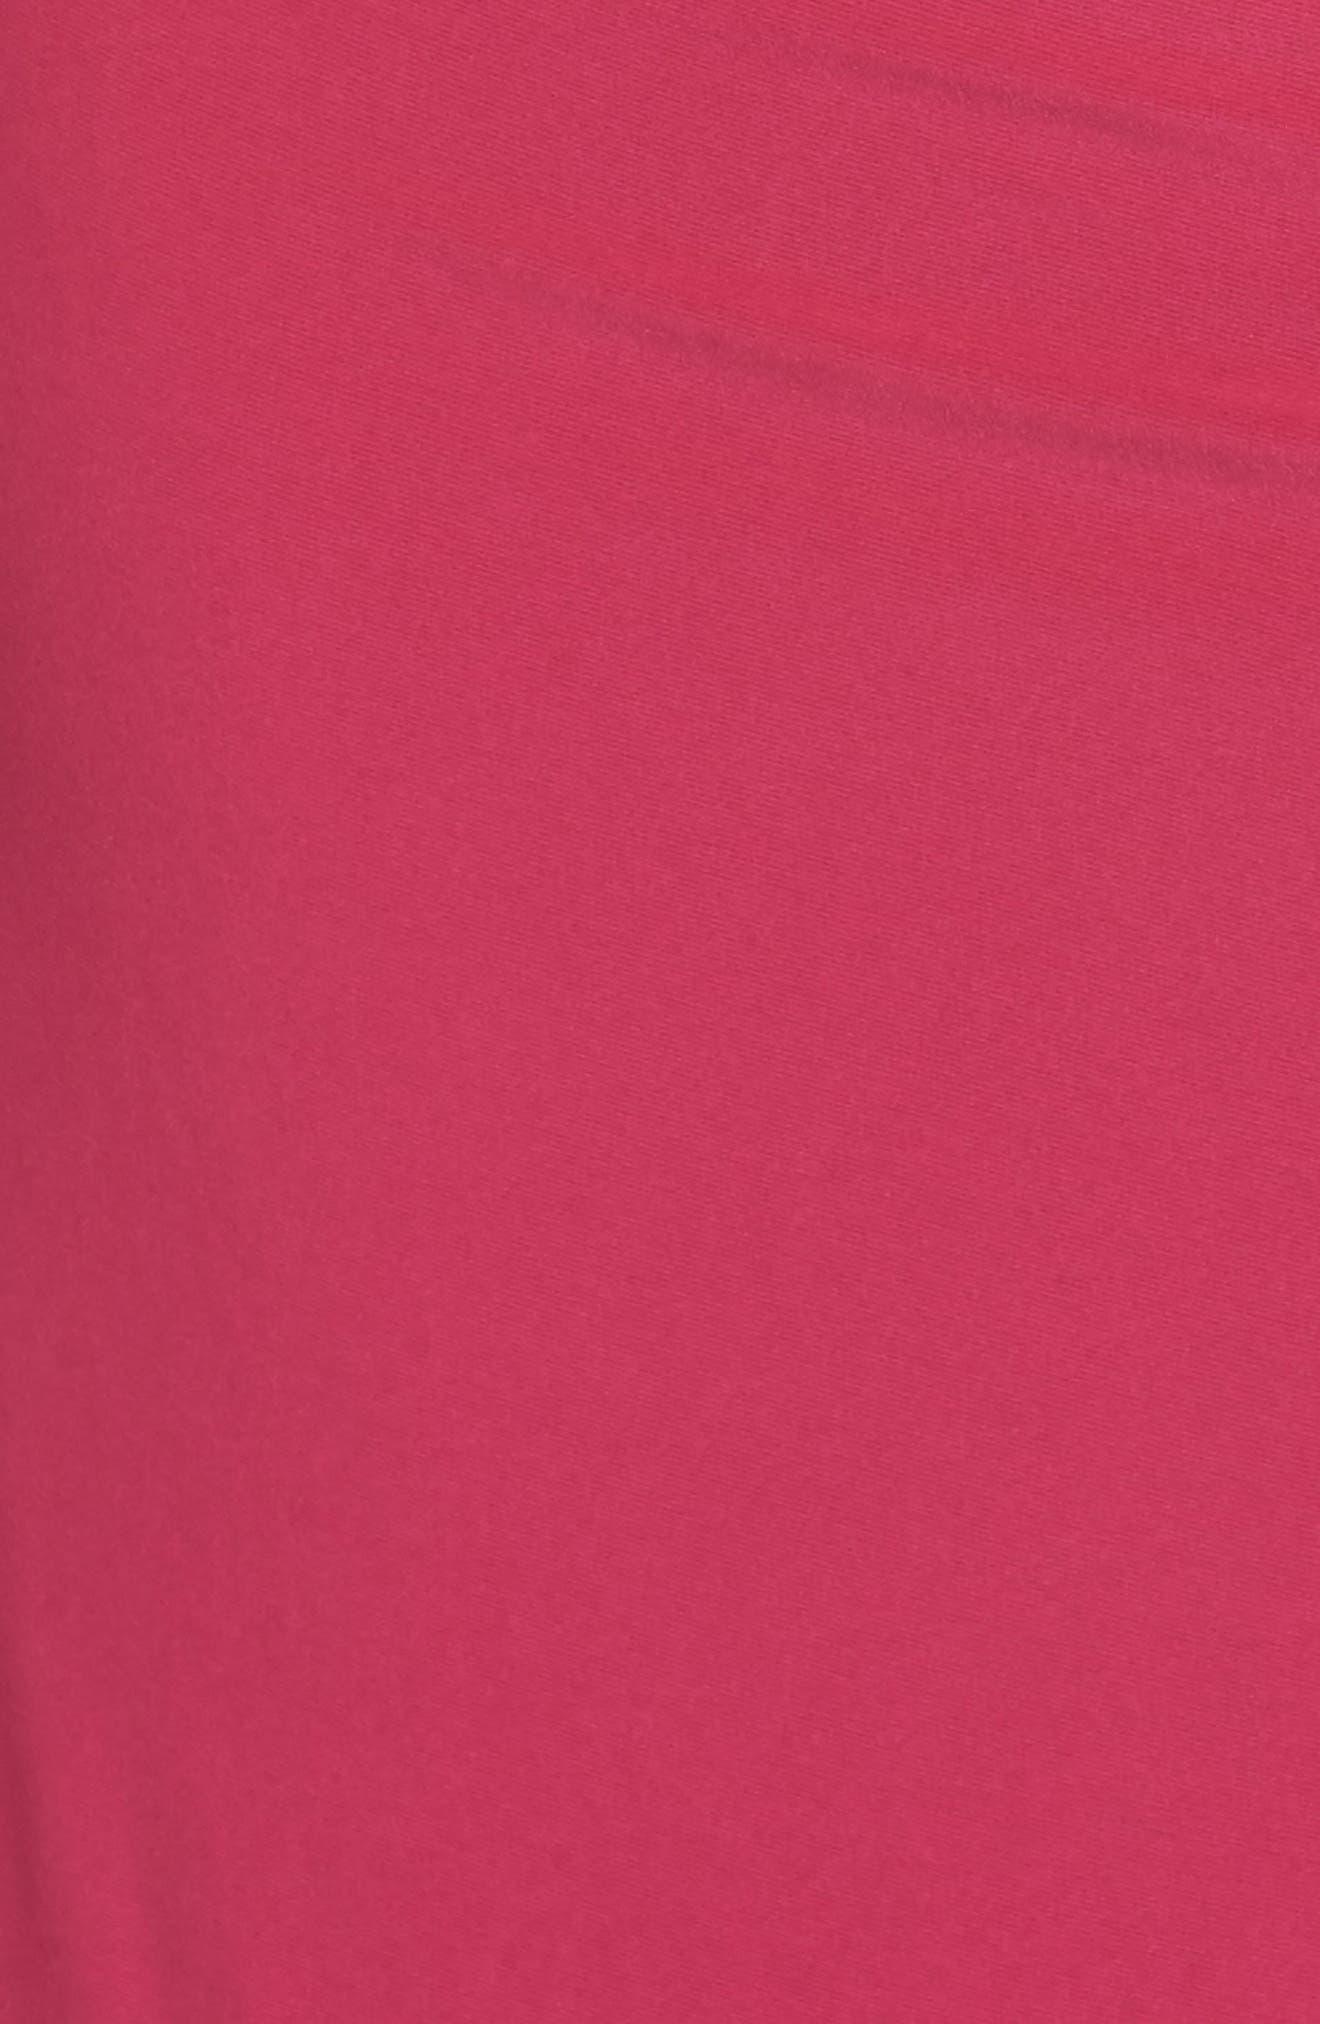 Off the Shoulder Jersey Dress,                             Alternate thumbnail 5, color,                             Bright Syrah